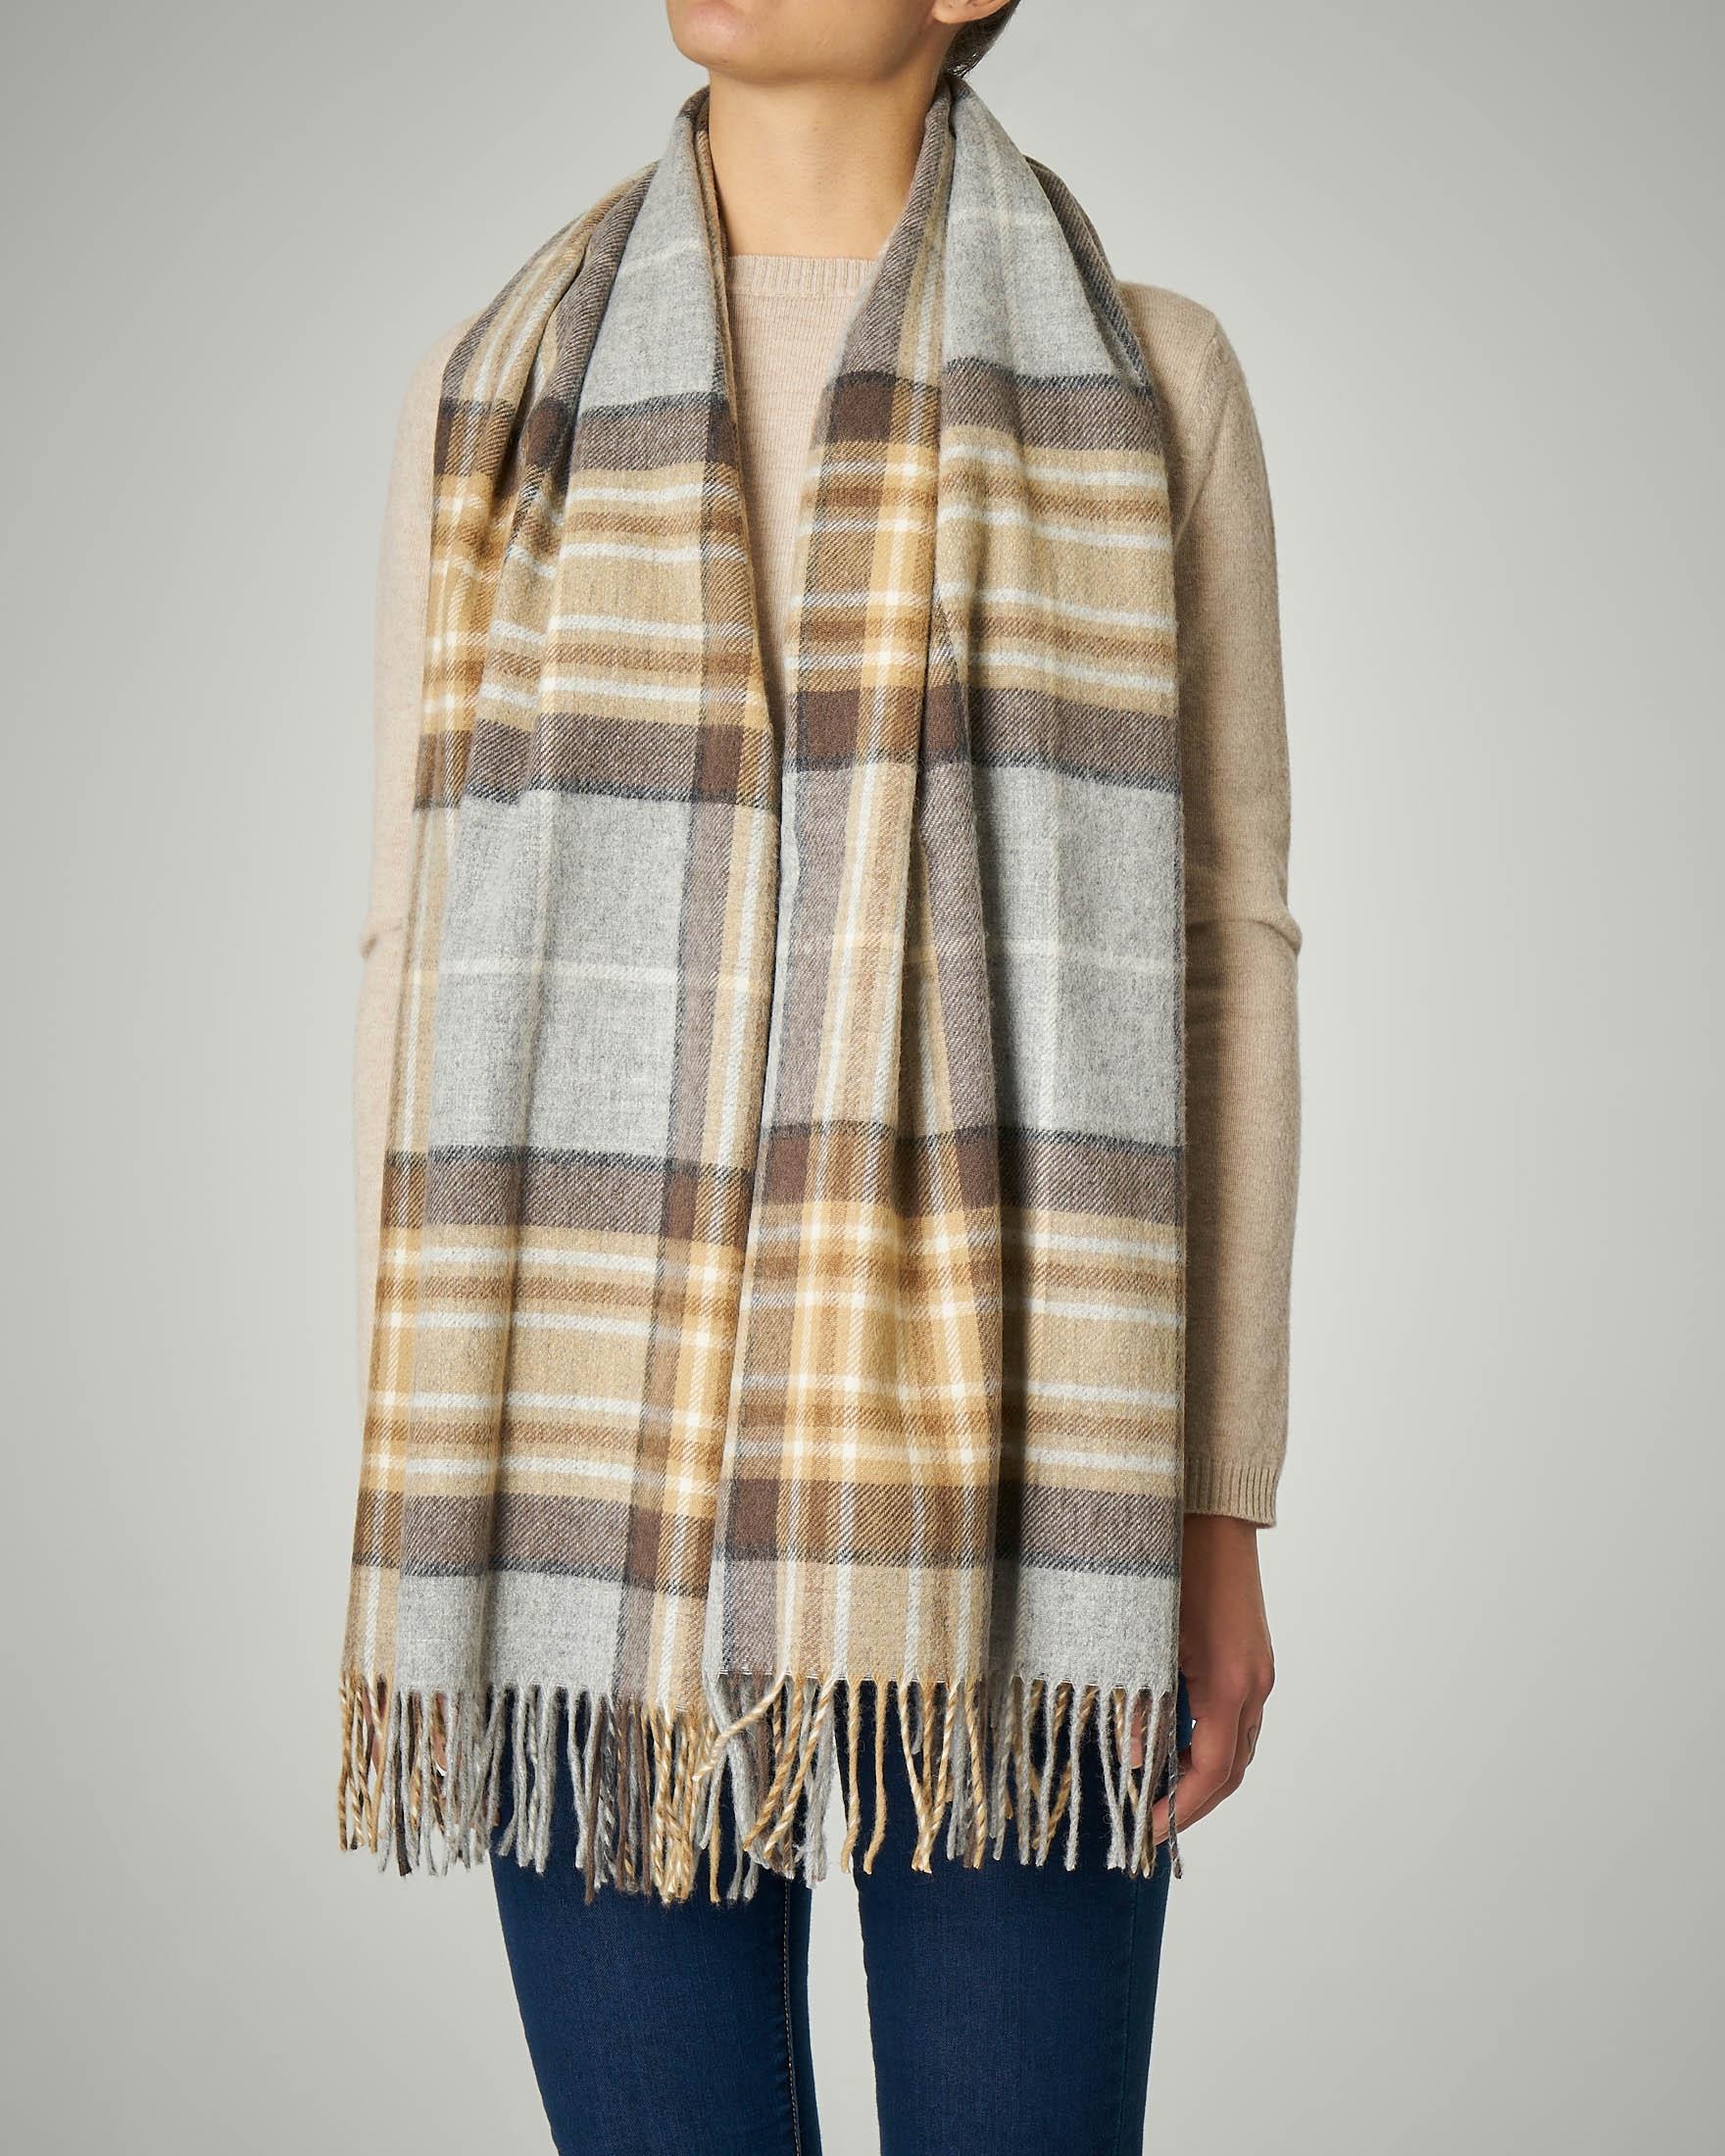 Sciarpa in lana merino a fantasia tartan beige con frange